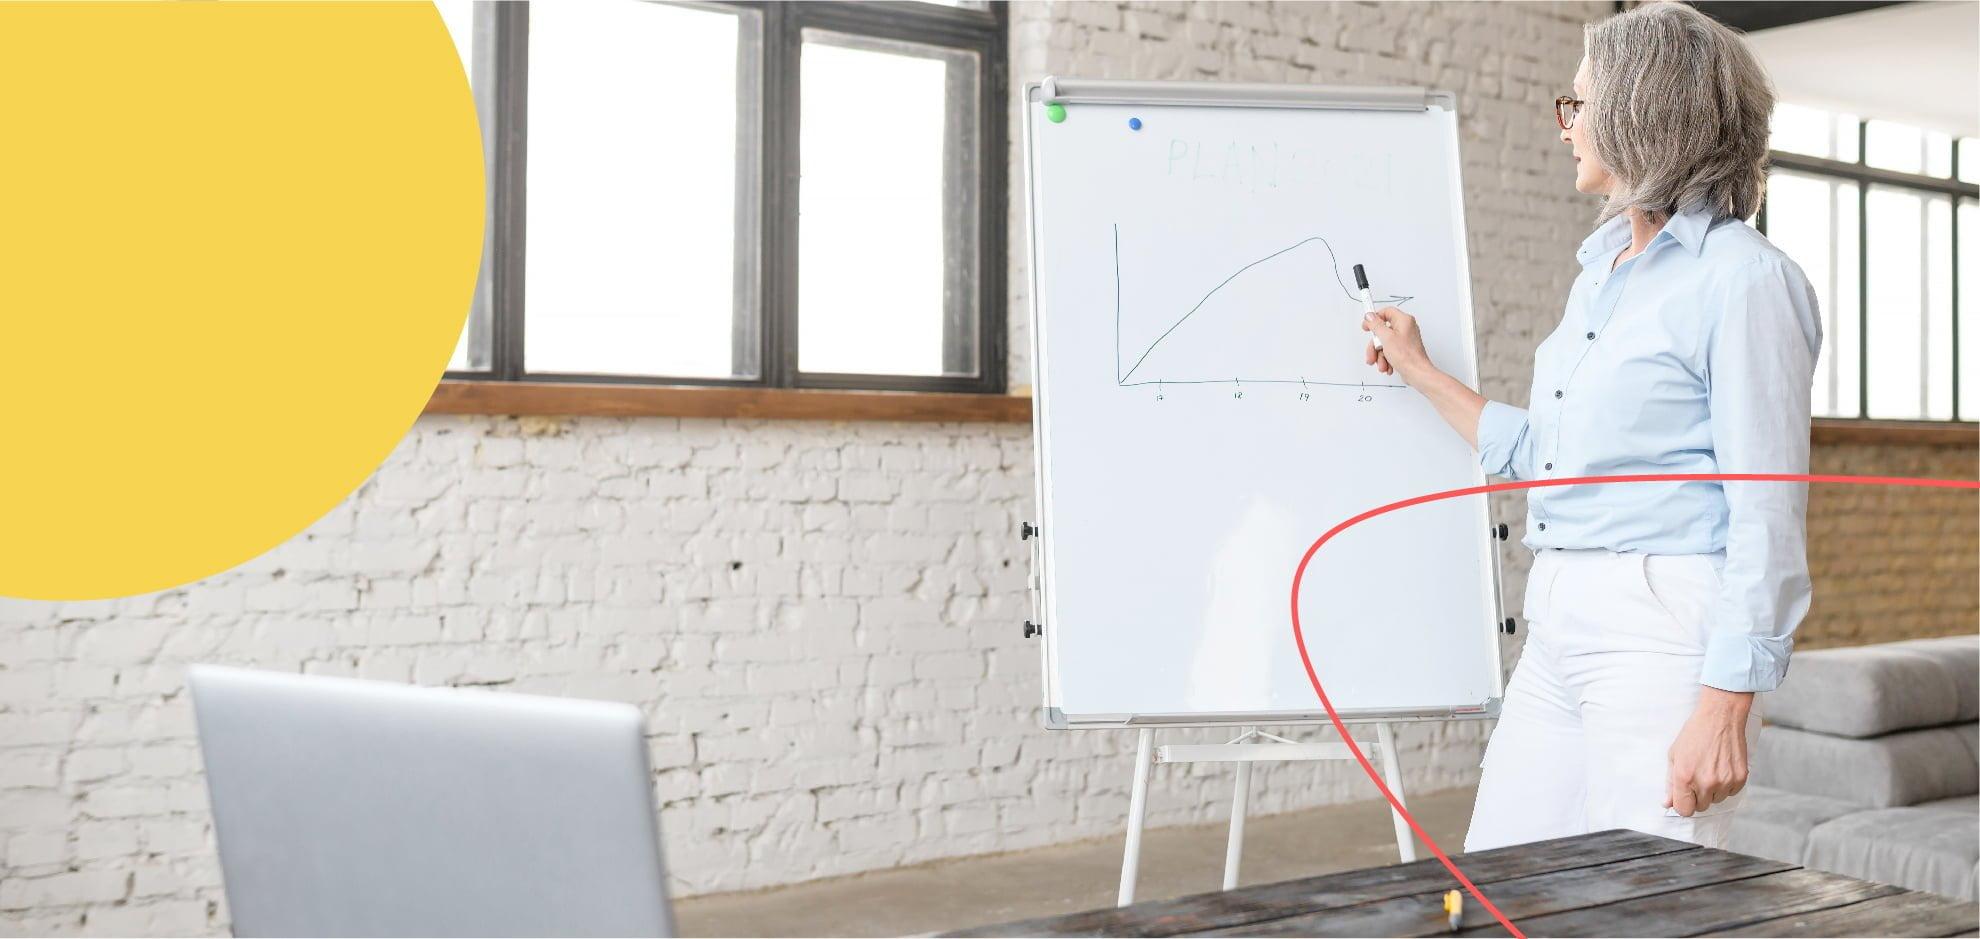 digital whiteboard tools